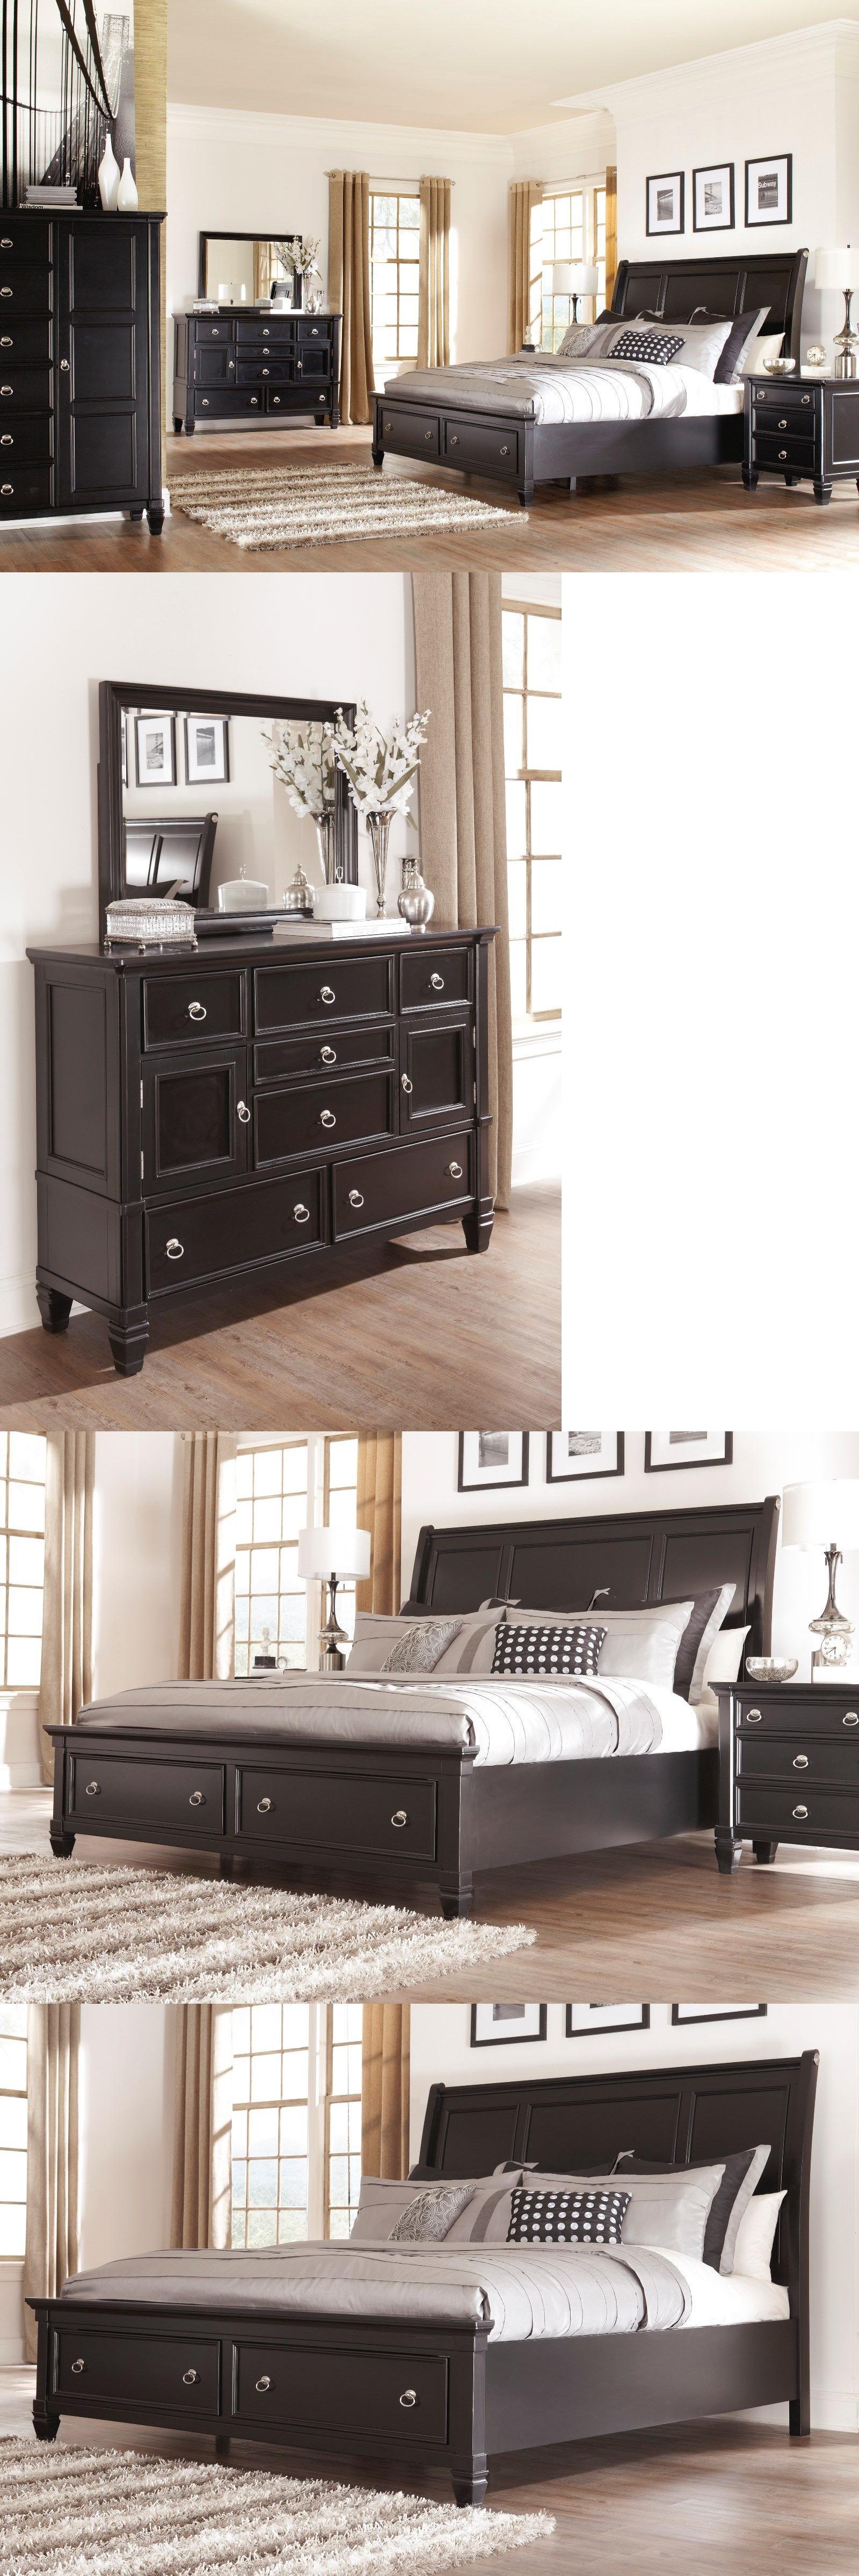 Bedroom Sets 20480: Ashley Greensburg 6 Piece Queen Bed Set W ...